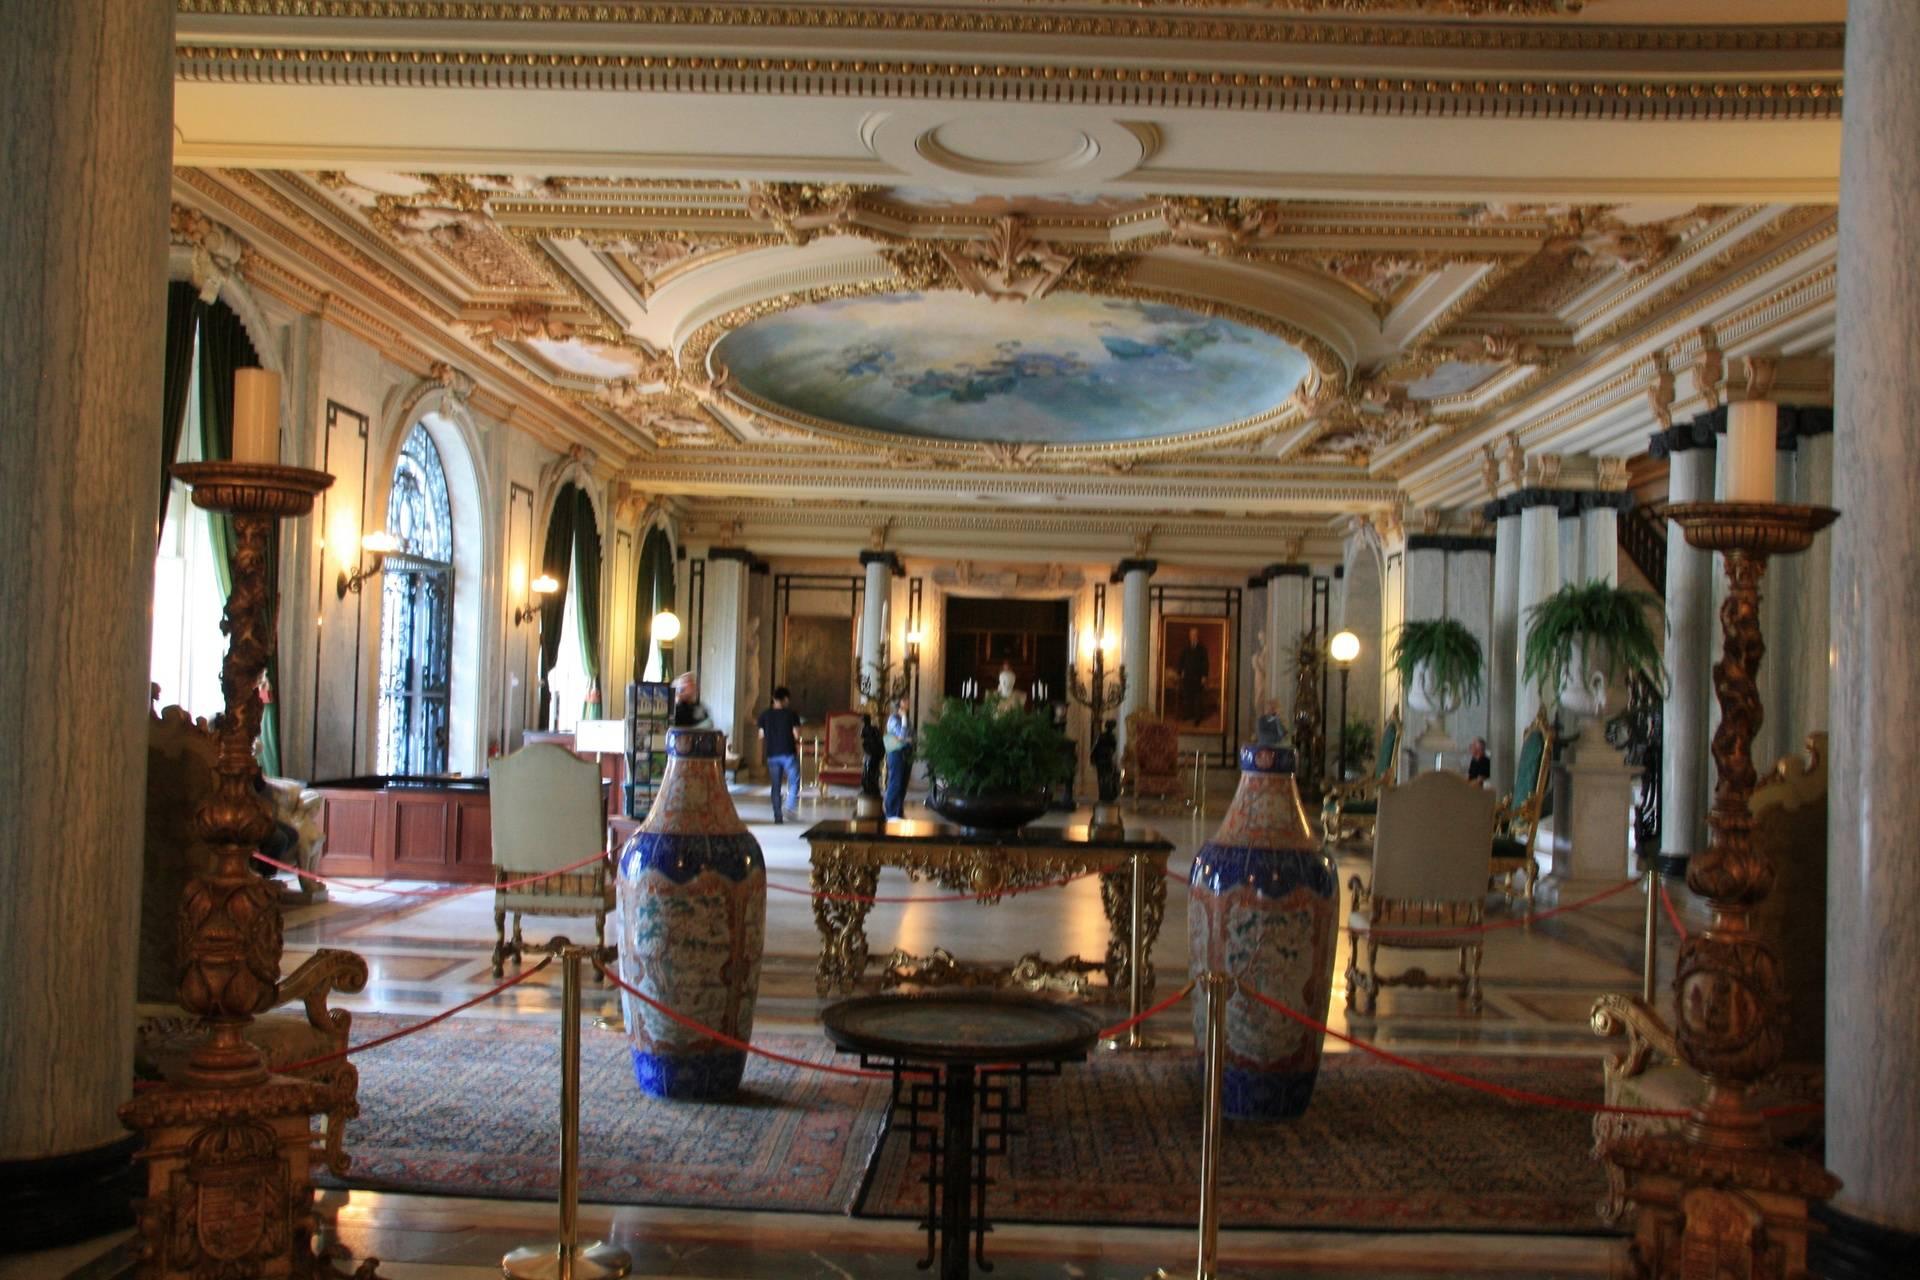 Flagler Museum, Palm Beach FL - Great hall